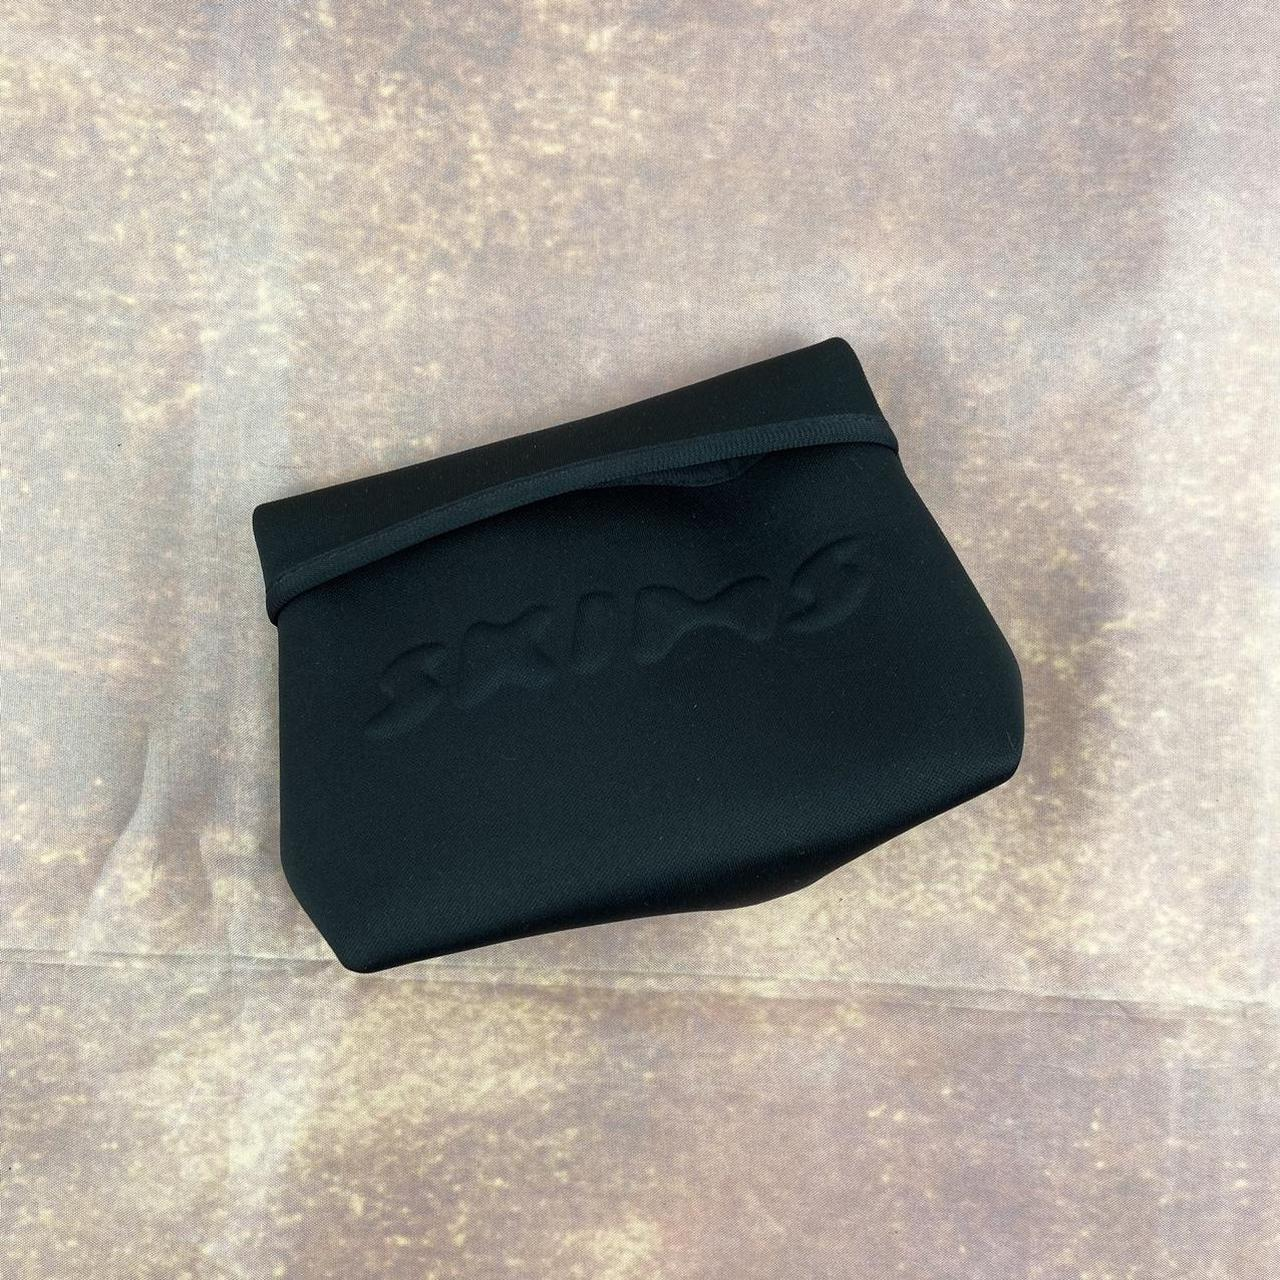 Product Image 1 - Free Shipping 💐 SKIMS neoprene